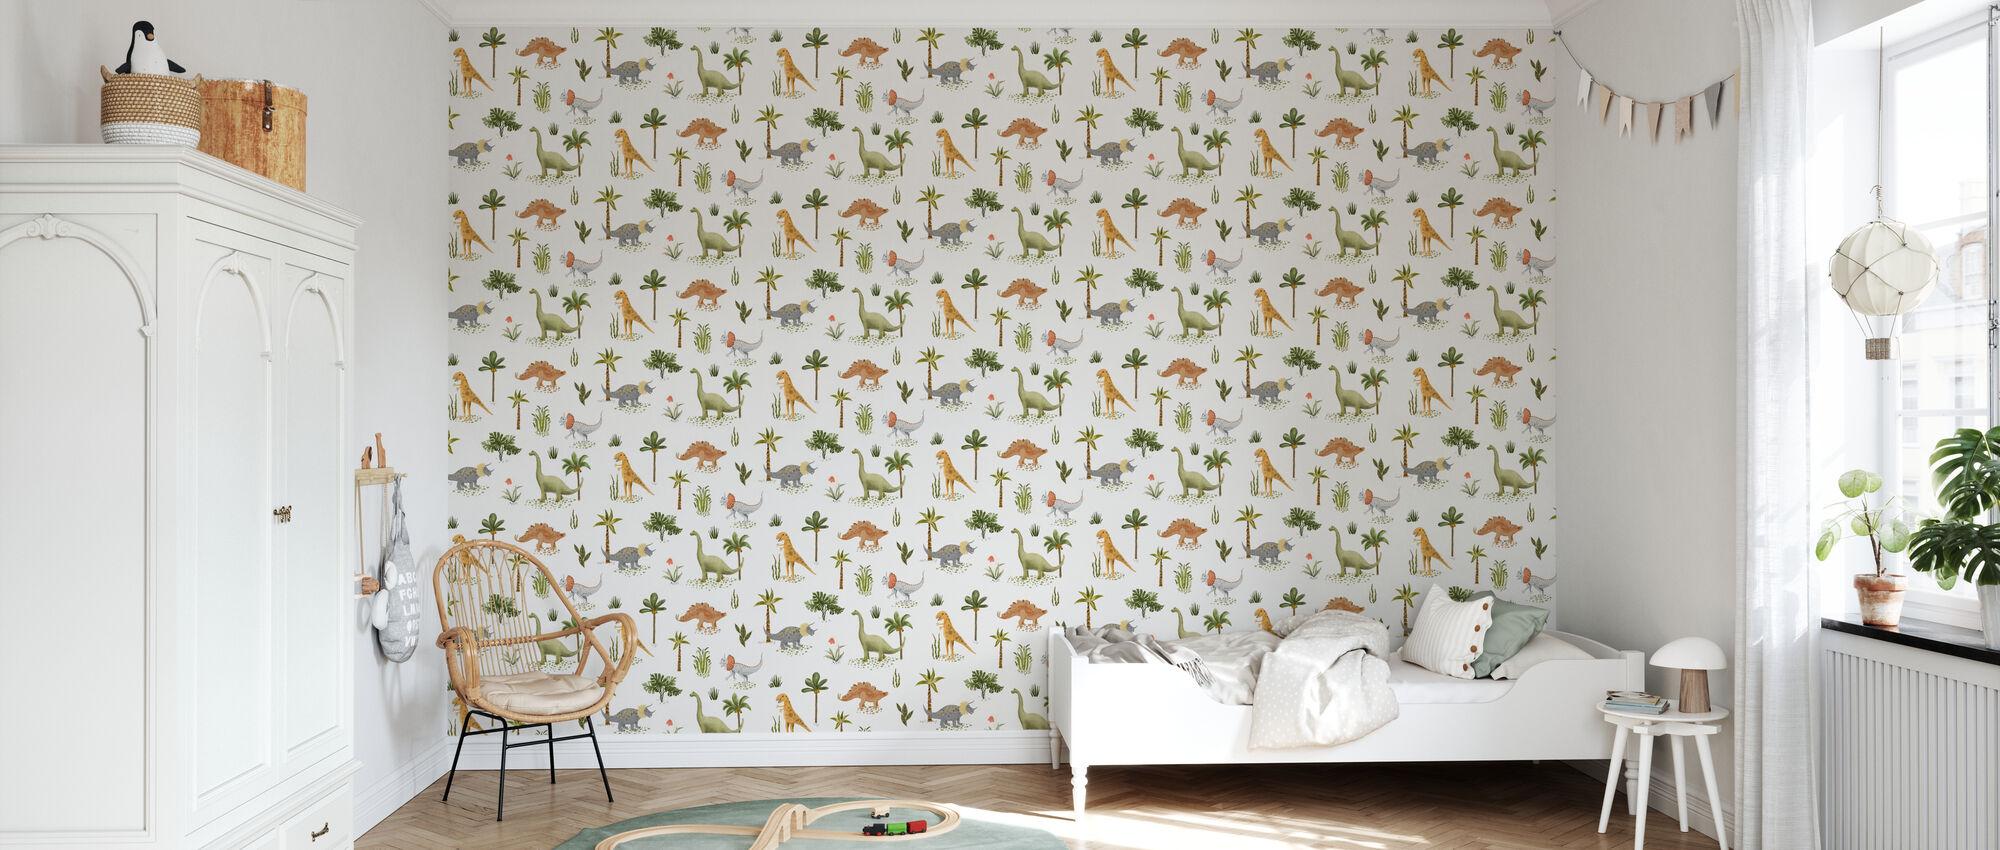 Dazzeling Dinos - Wallpaper - Kids Room